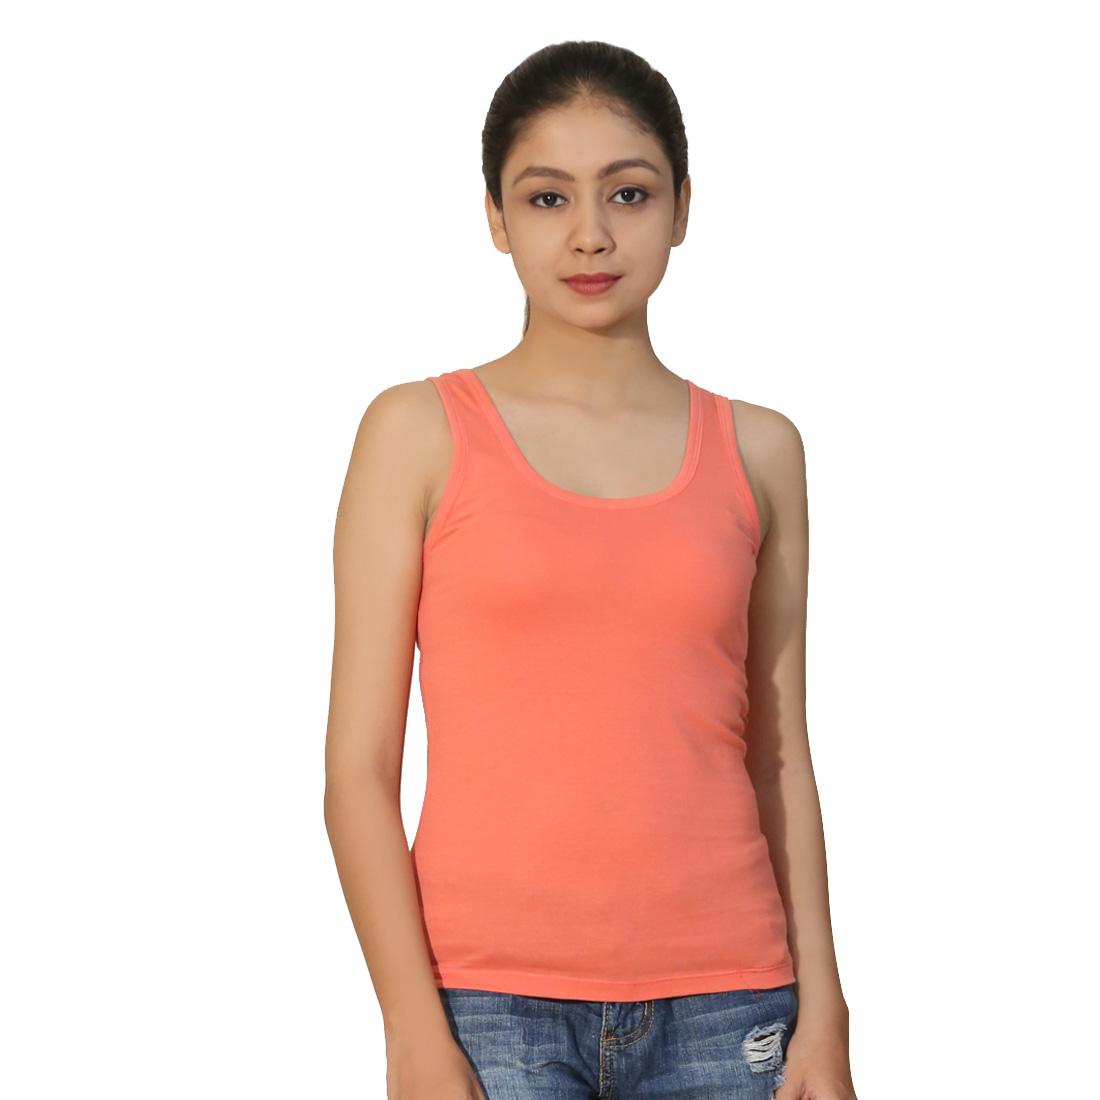 953fc82f3e705 Letizia Women s Cotton Round Neck Tank Top - Buy Tube Top